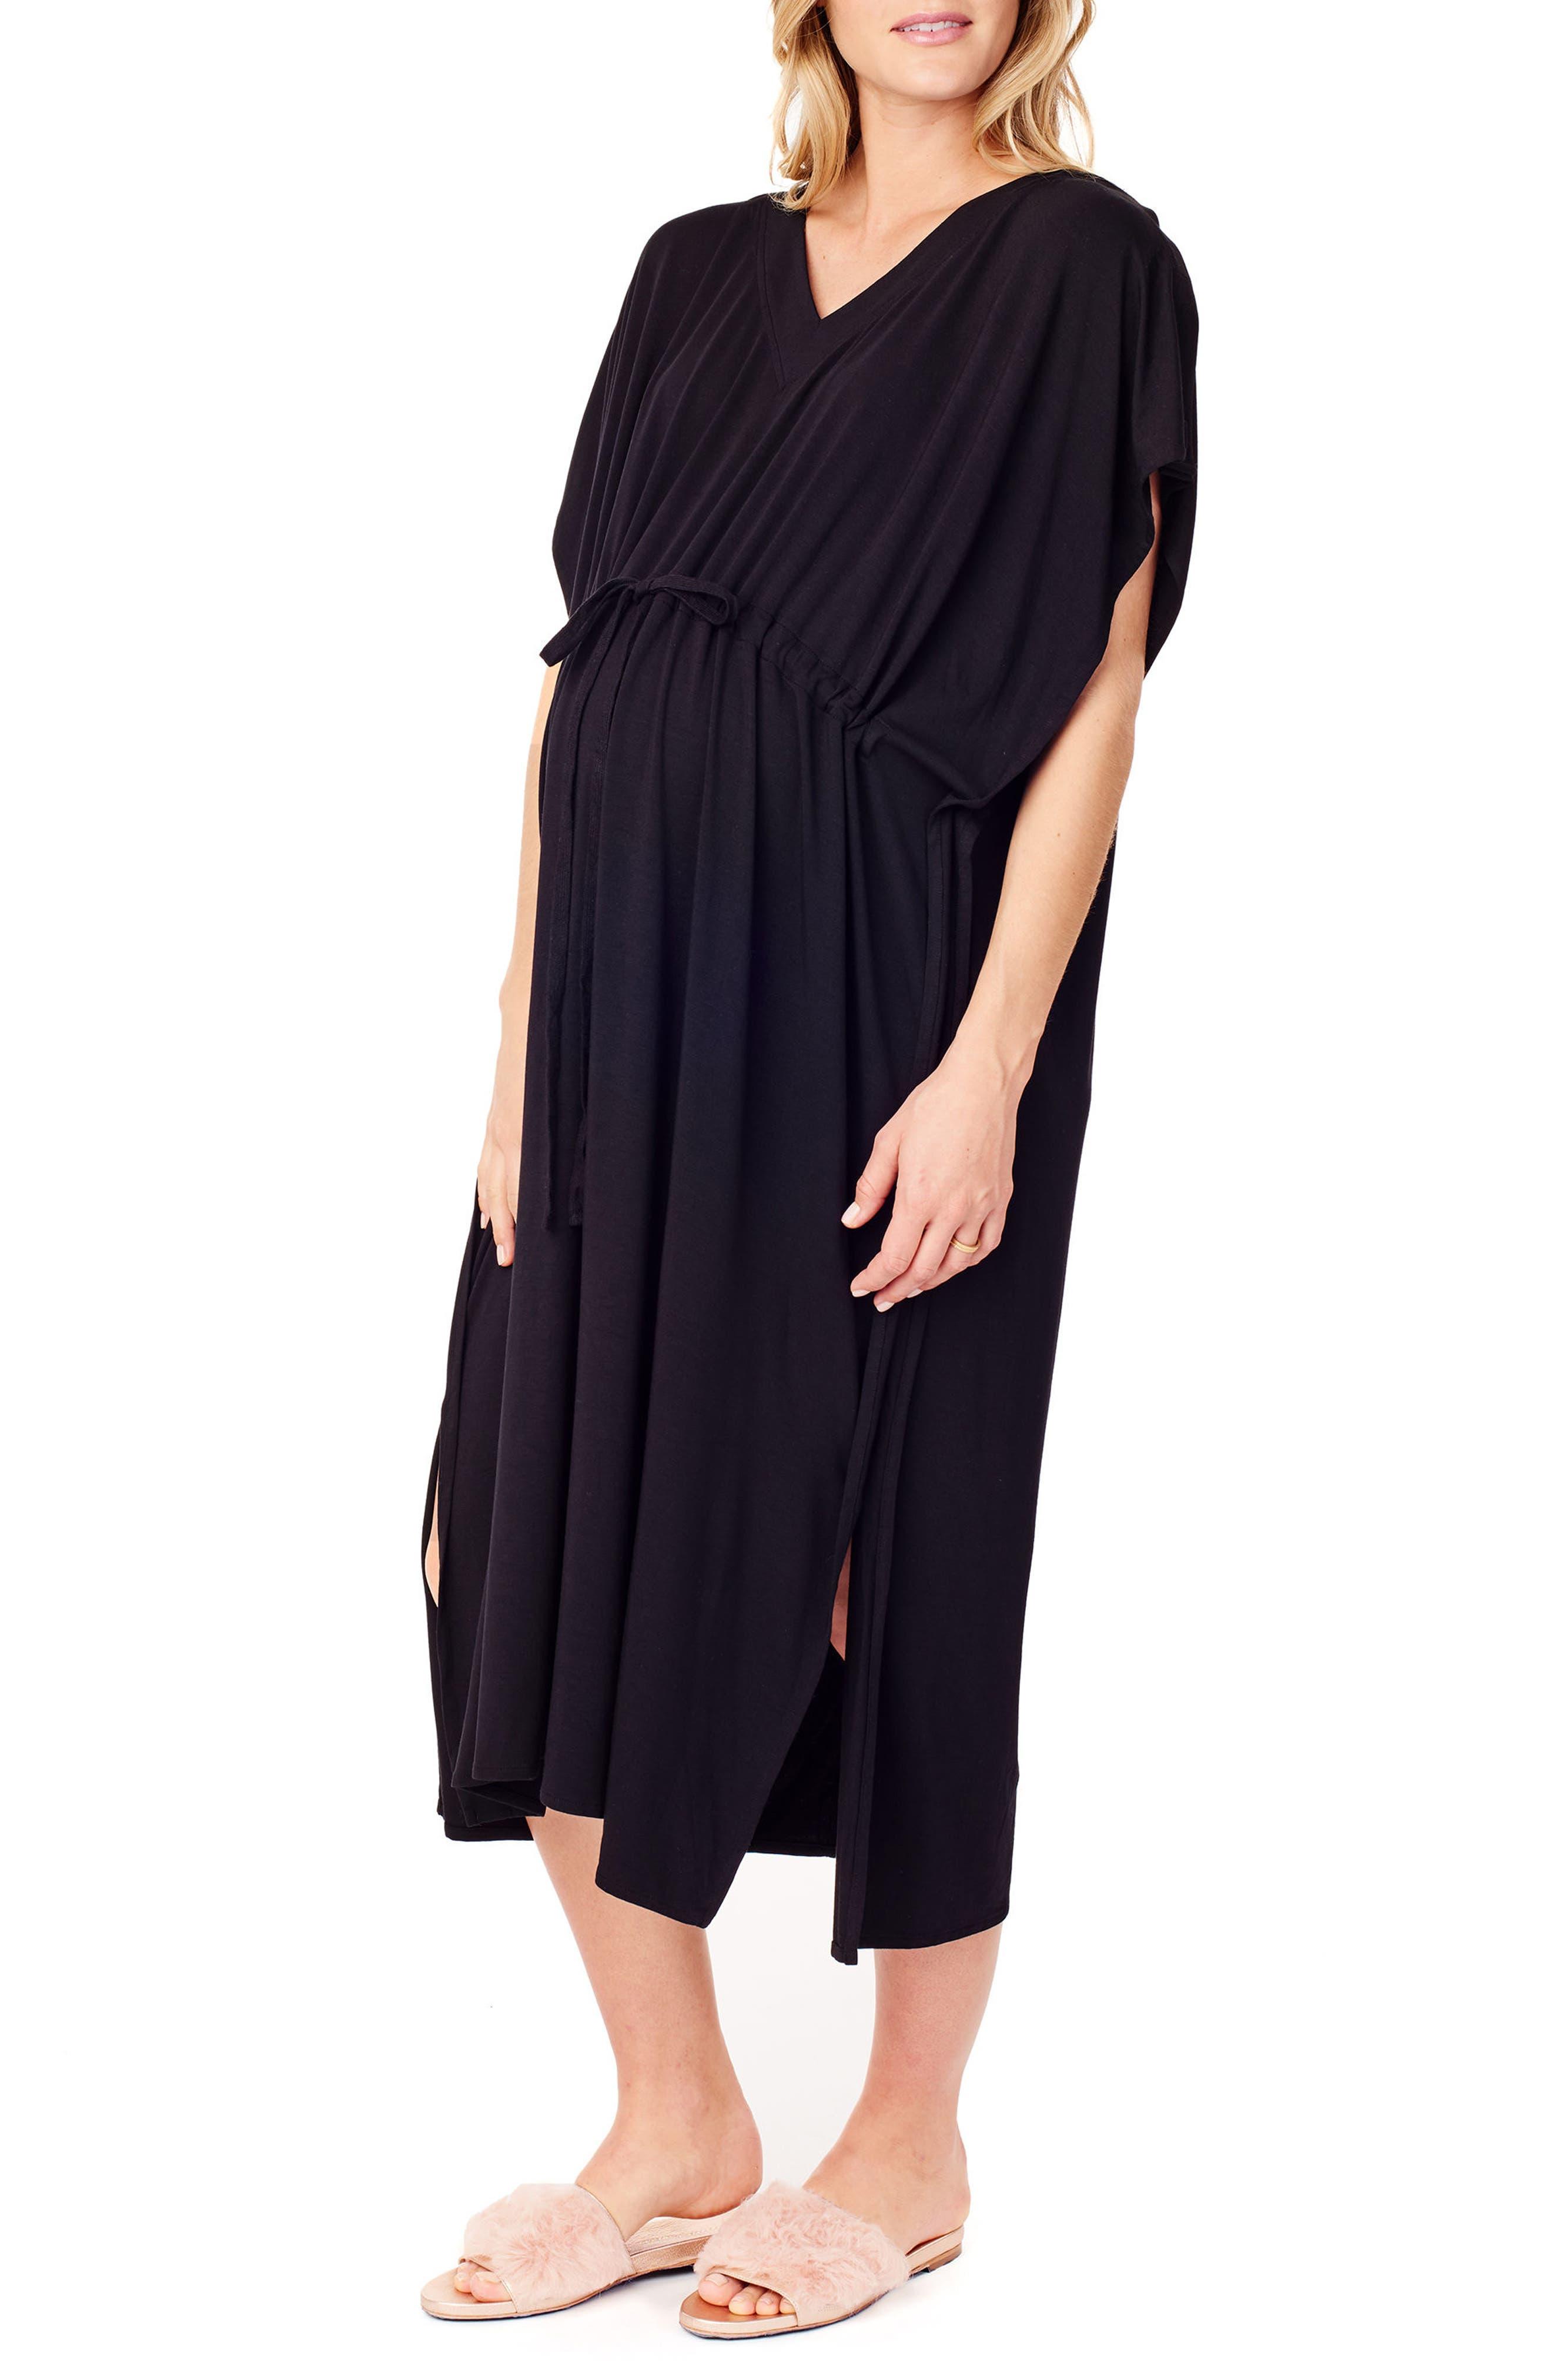 x James Fox & Co. Maternity/Nursing Hospital Gown,                             Alternate thumbnail 3, color,                             Jet Black